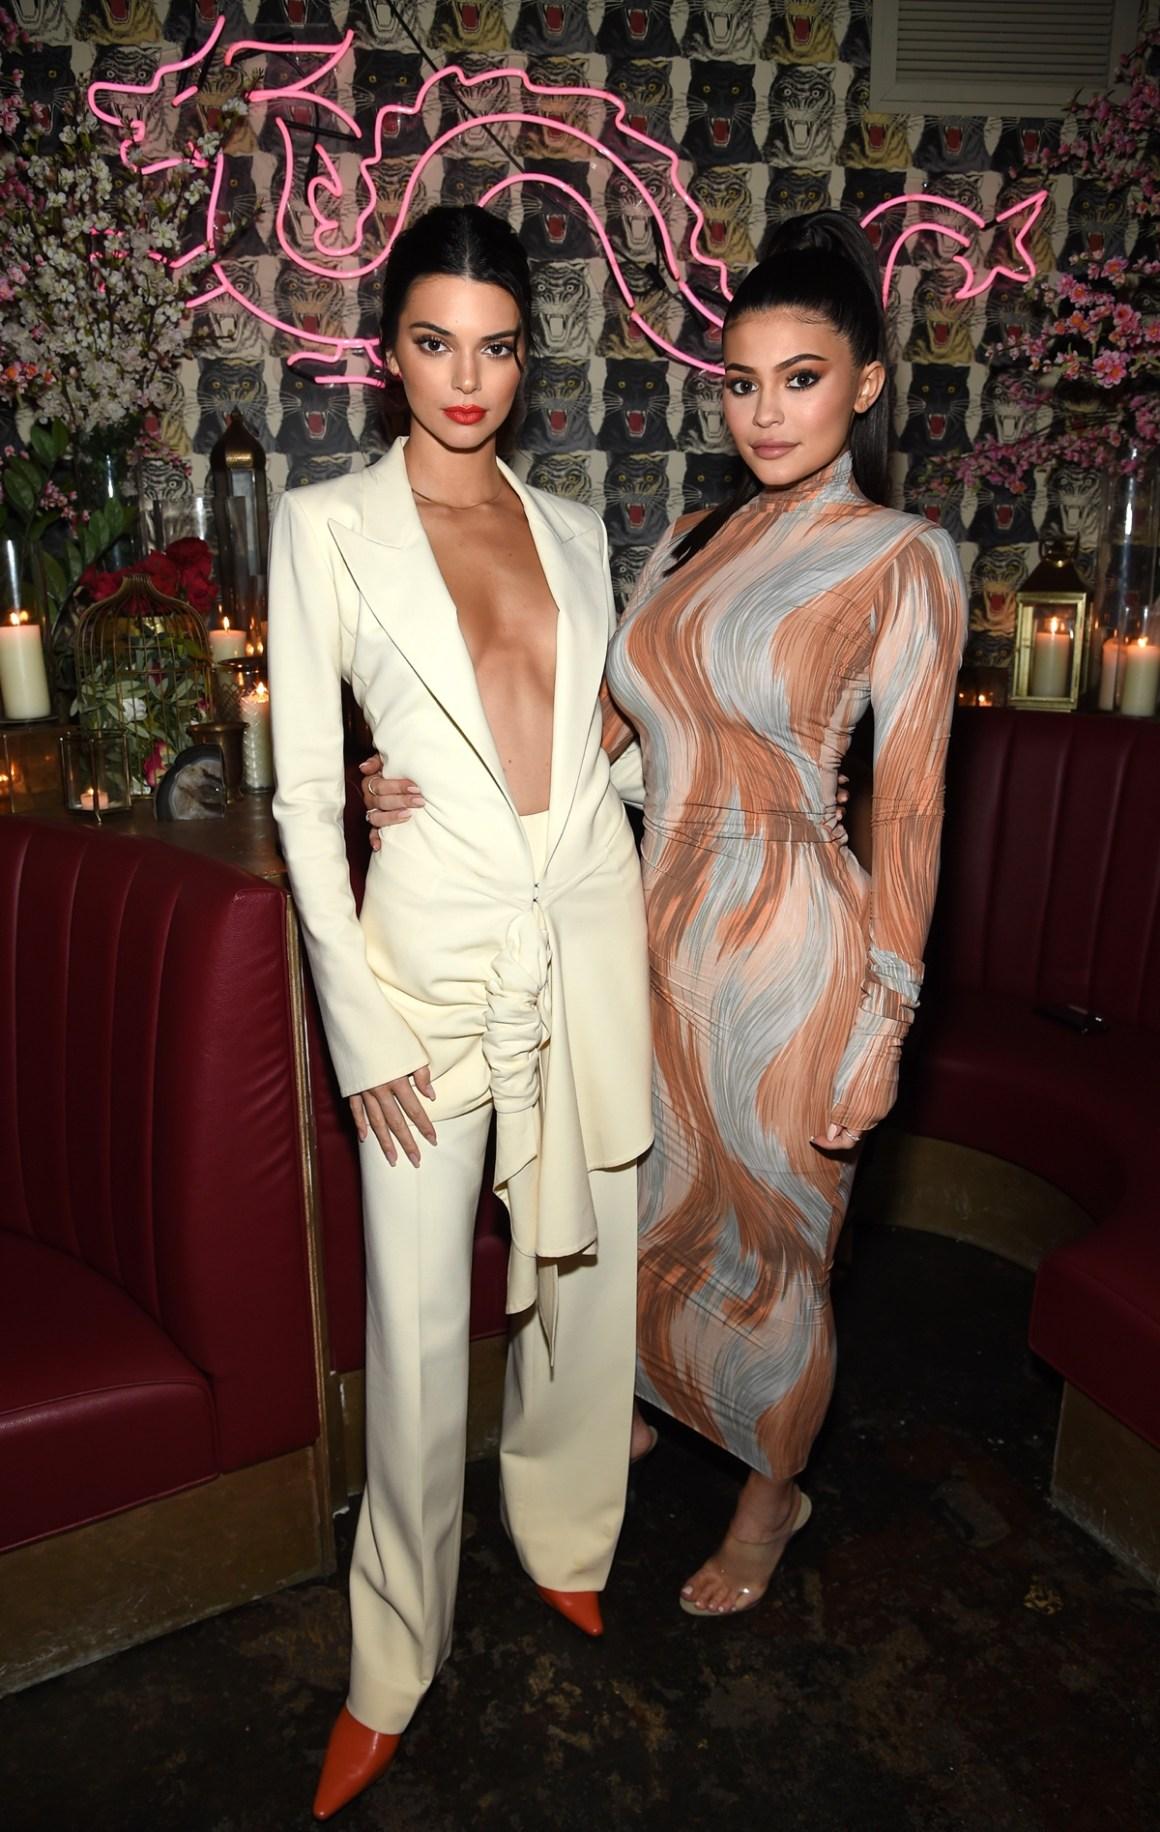 Kendall Jenner naked intruder arrested for stalking Kylie just hours after being released from jail 4